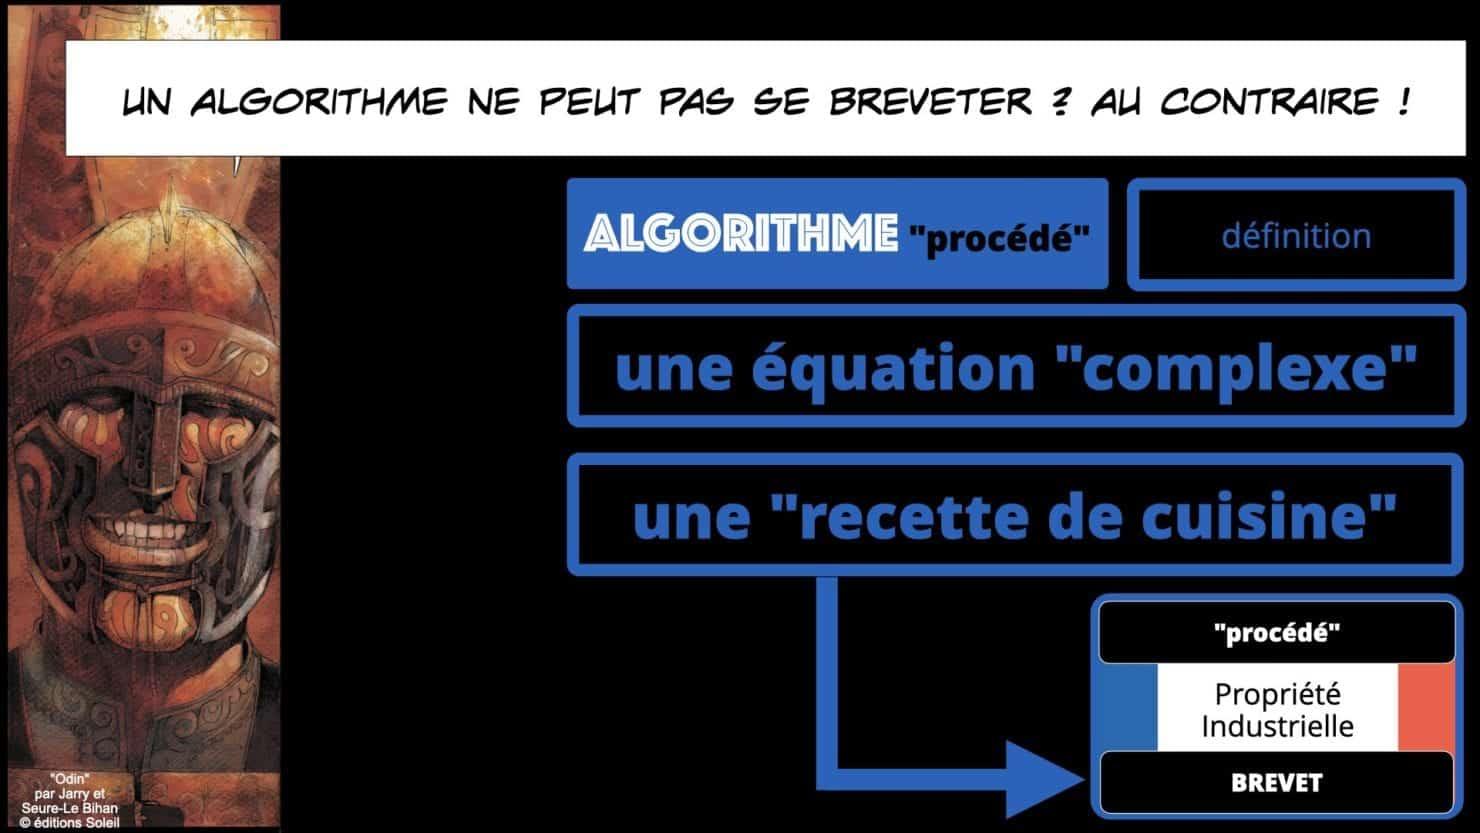 307 Intelligence artificielle-machine-learning-deep-learning-base de données-BIG-DATA *16:9* Constellation ©Ledieu-Avocat-13-10-2020.104